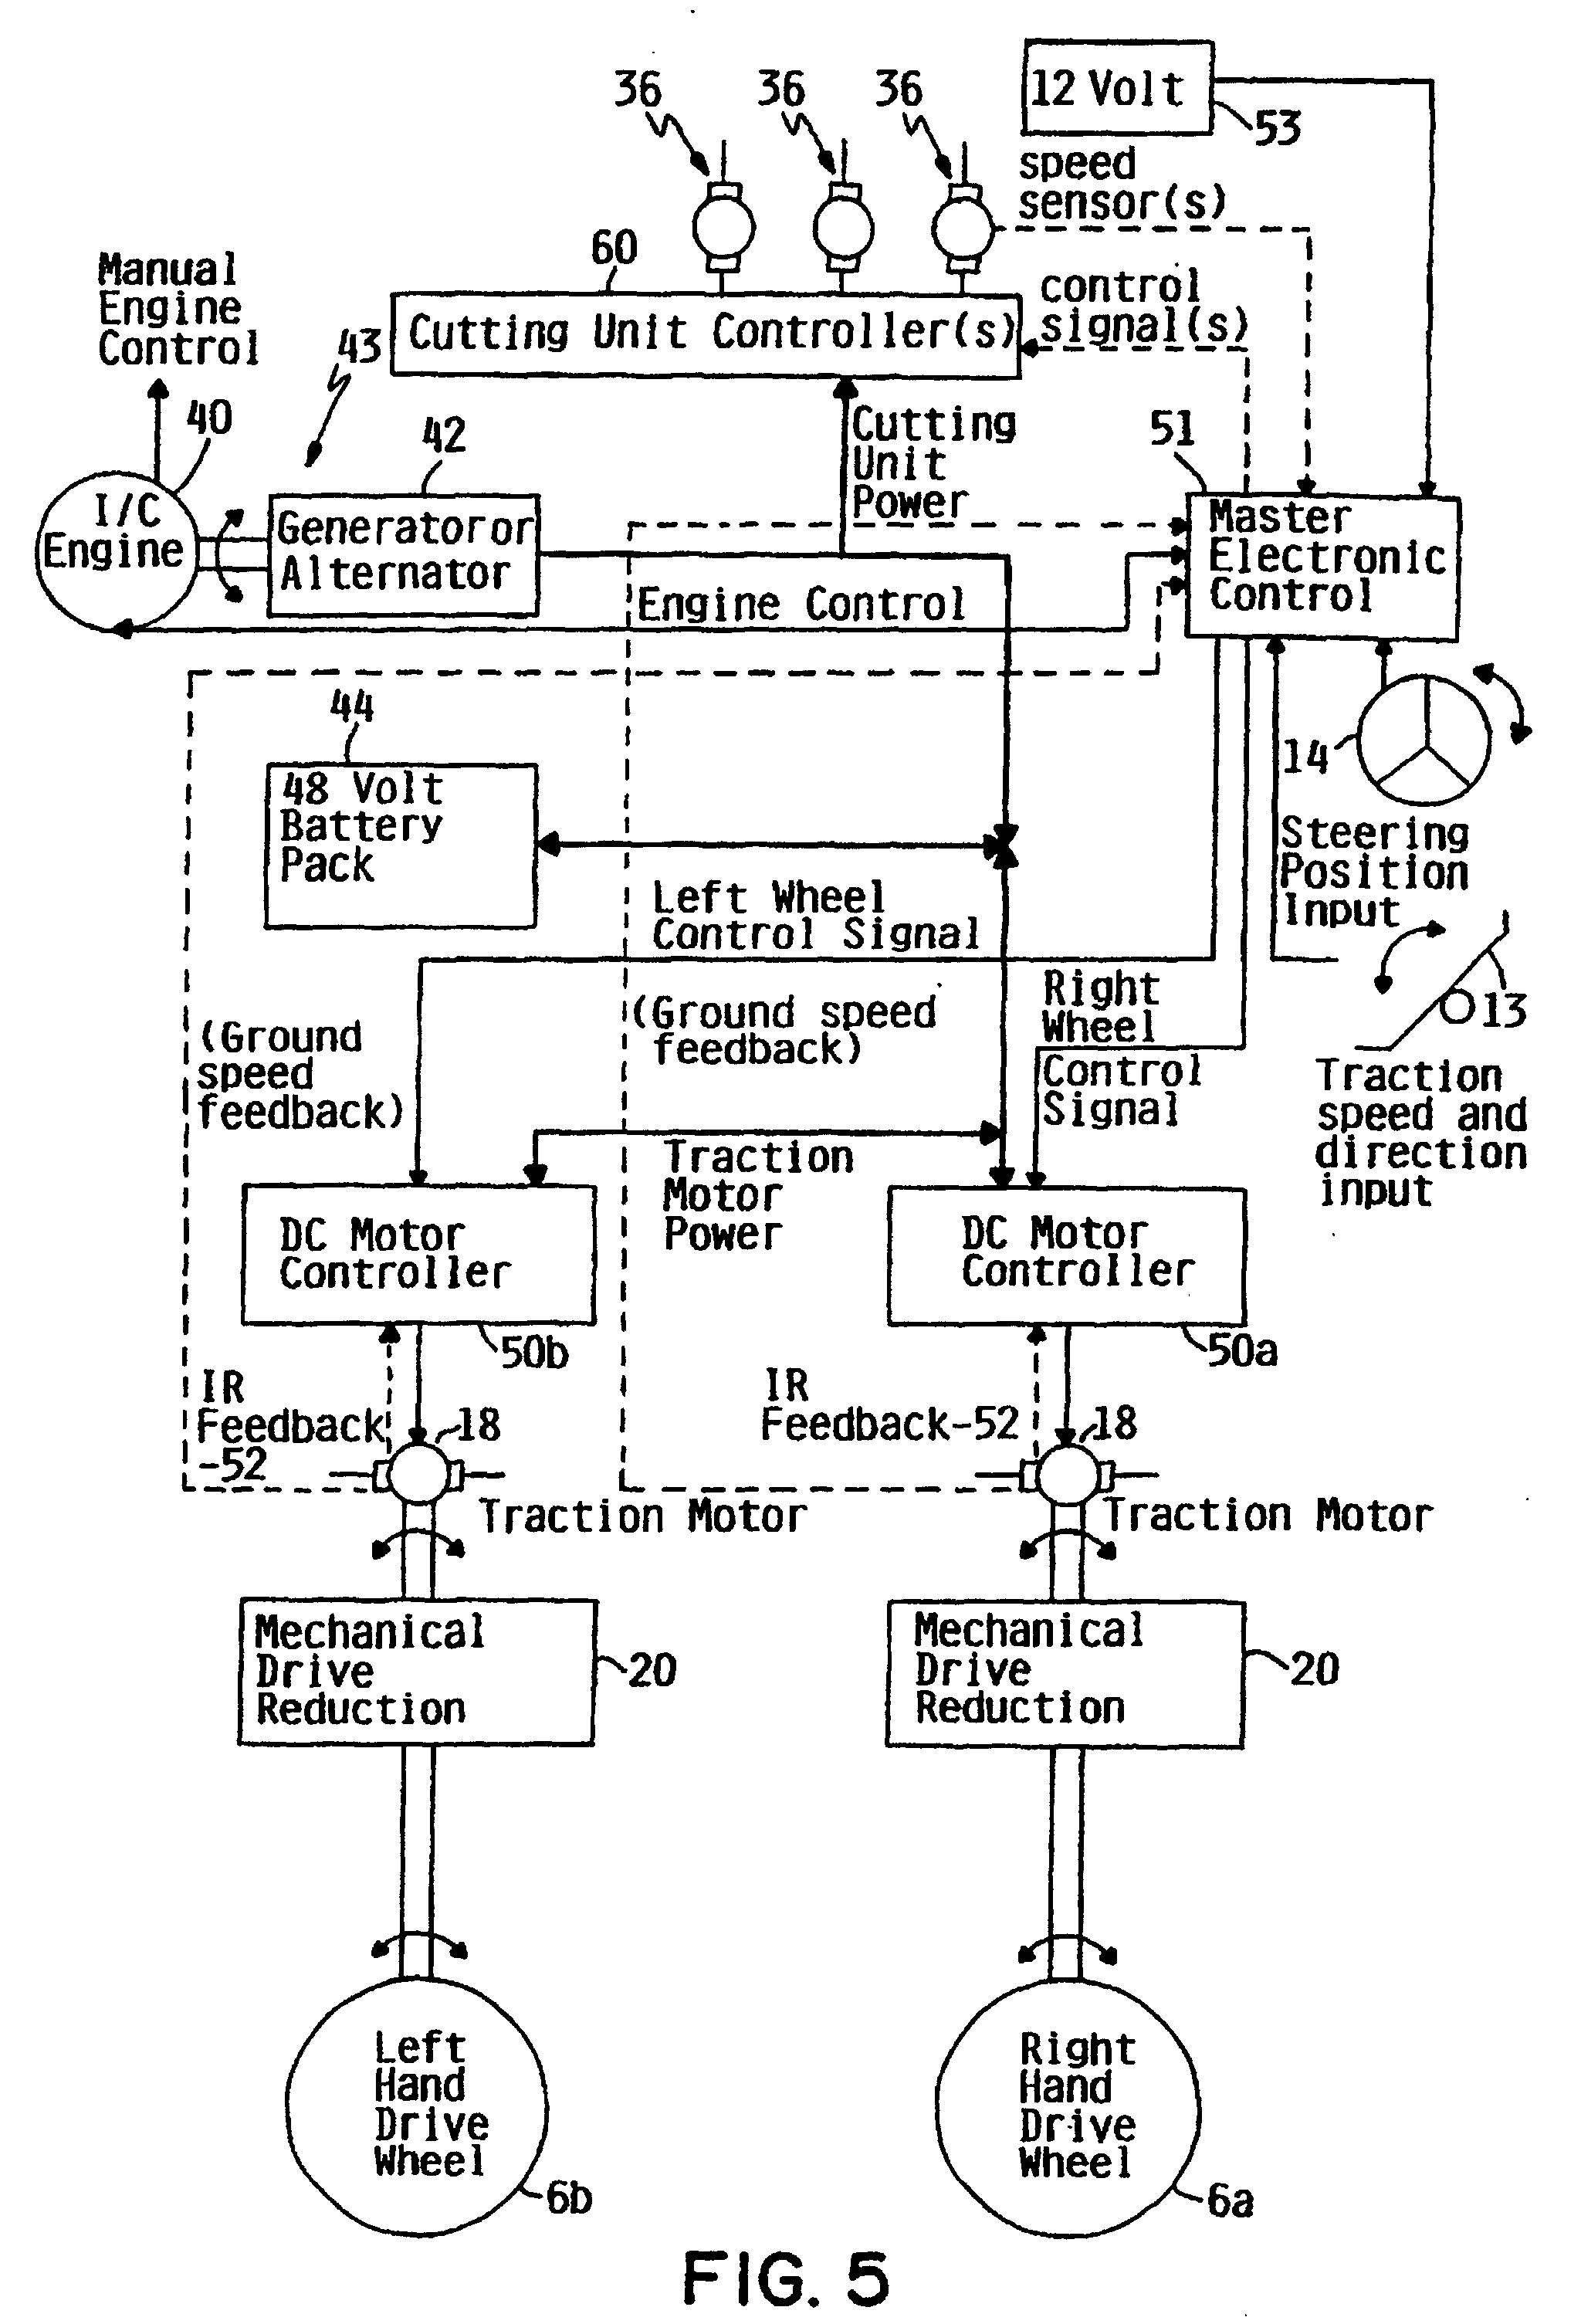 onan microlite 4000 wiring diagram wiring diagrams and schematics r k s onan 4 0kyfa26100 4000 watt microlite 0